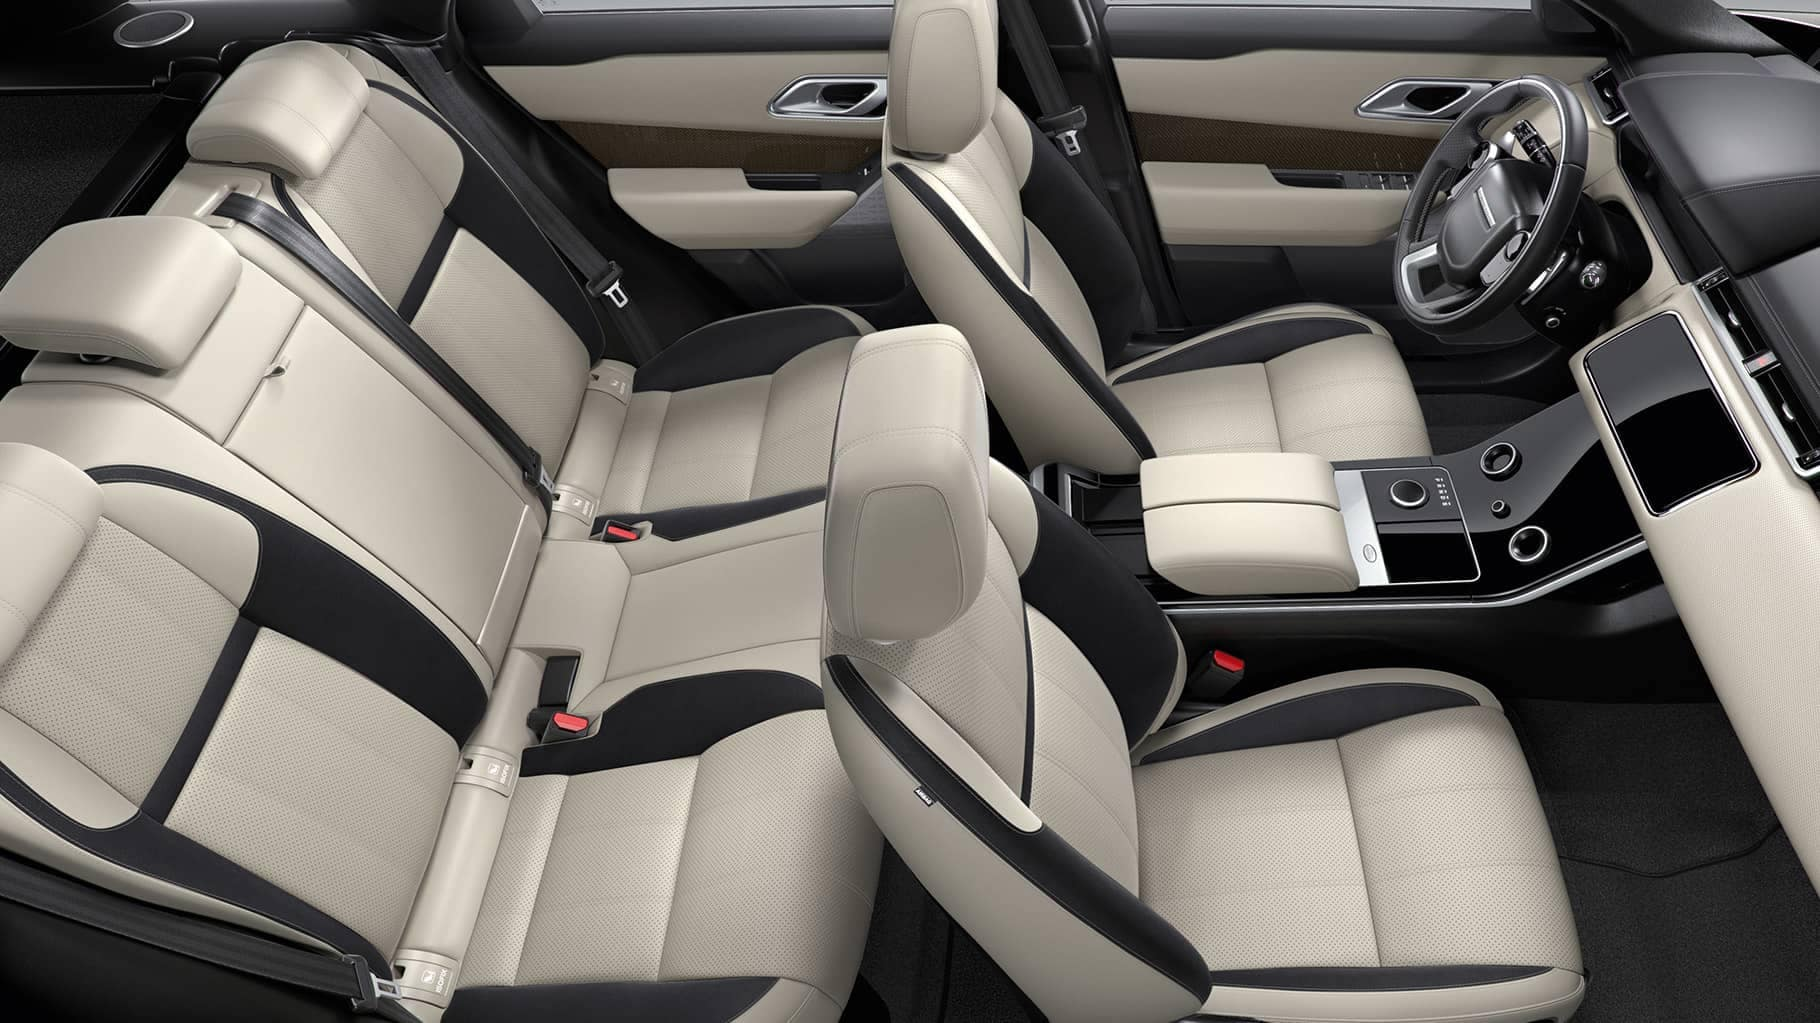 2019 Land Rover Velar Seating